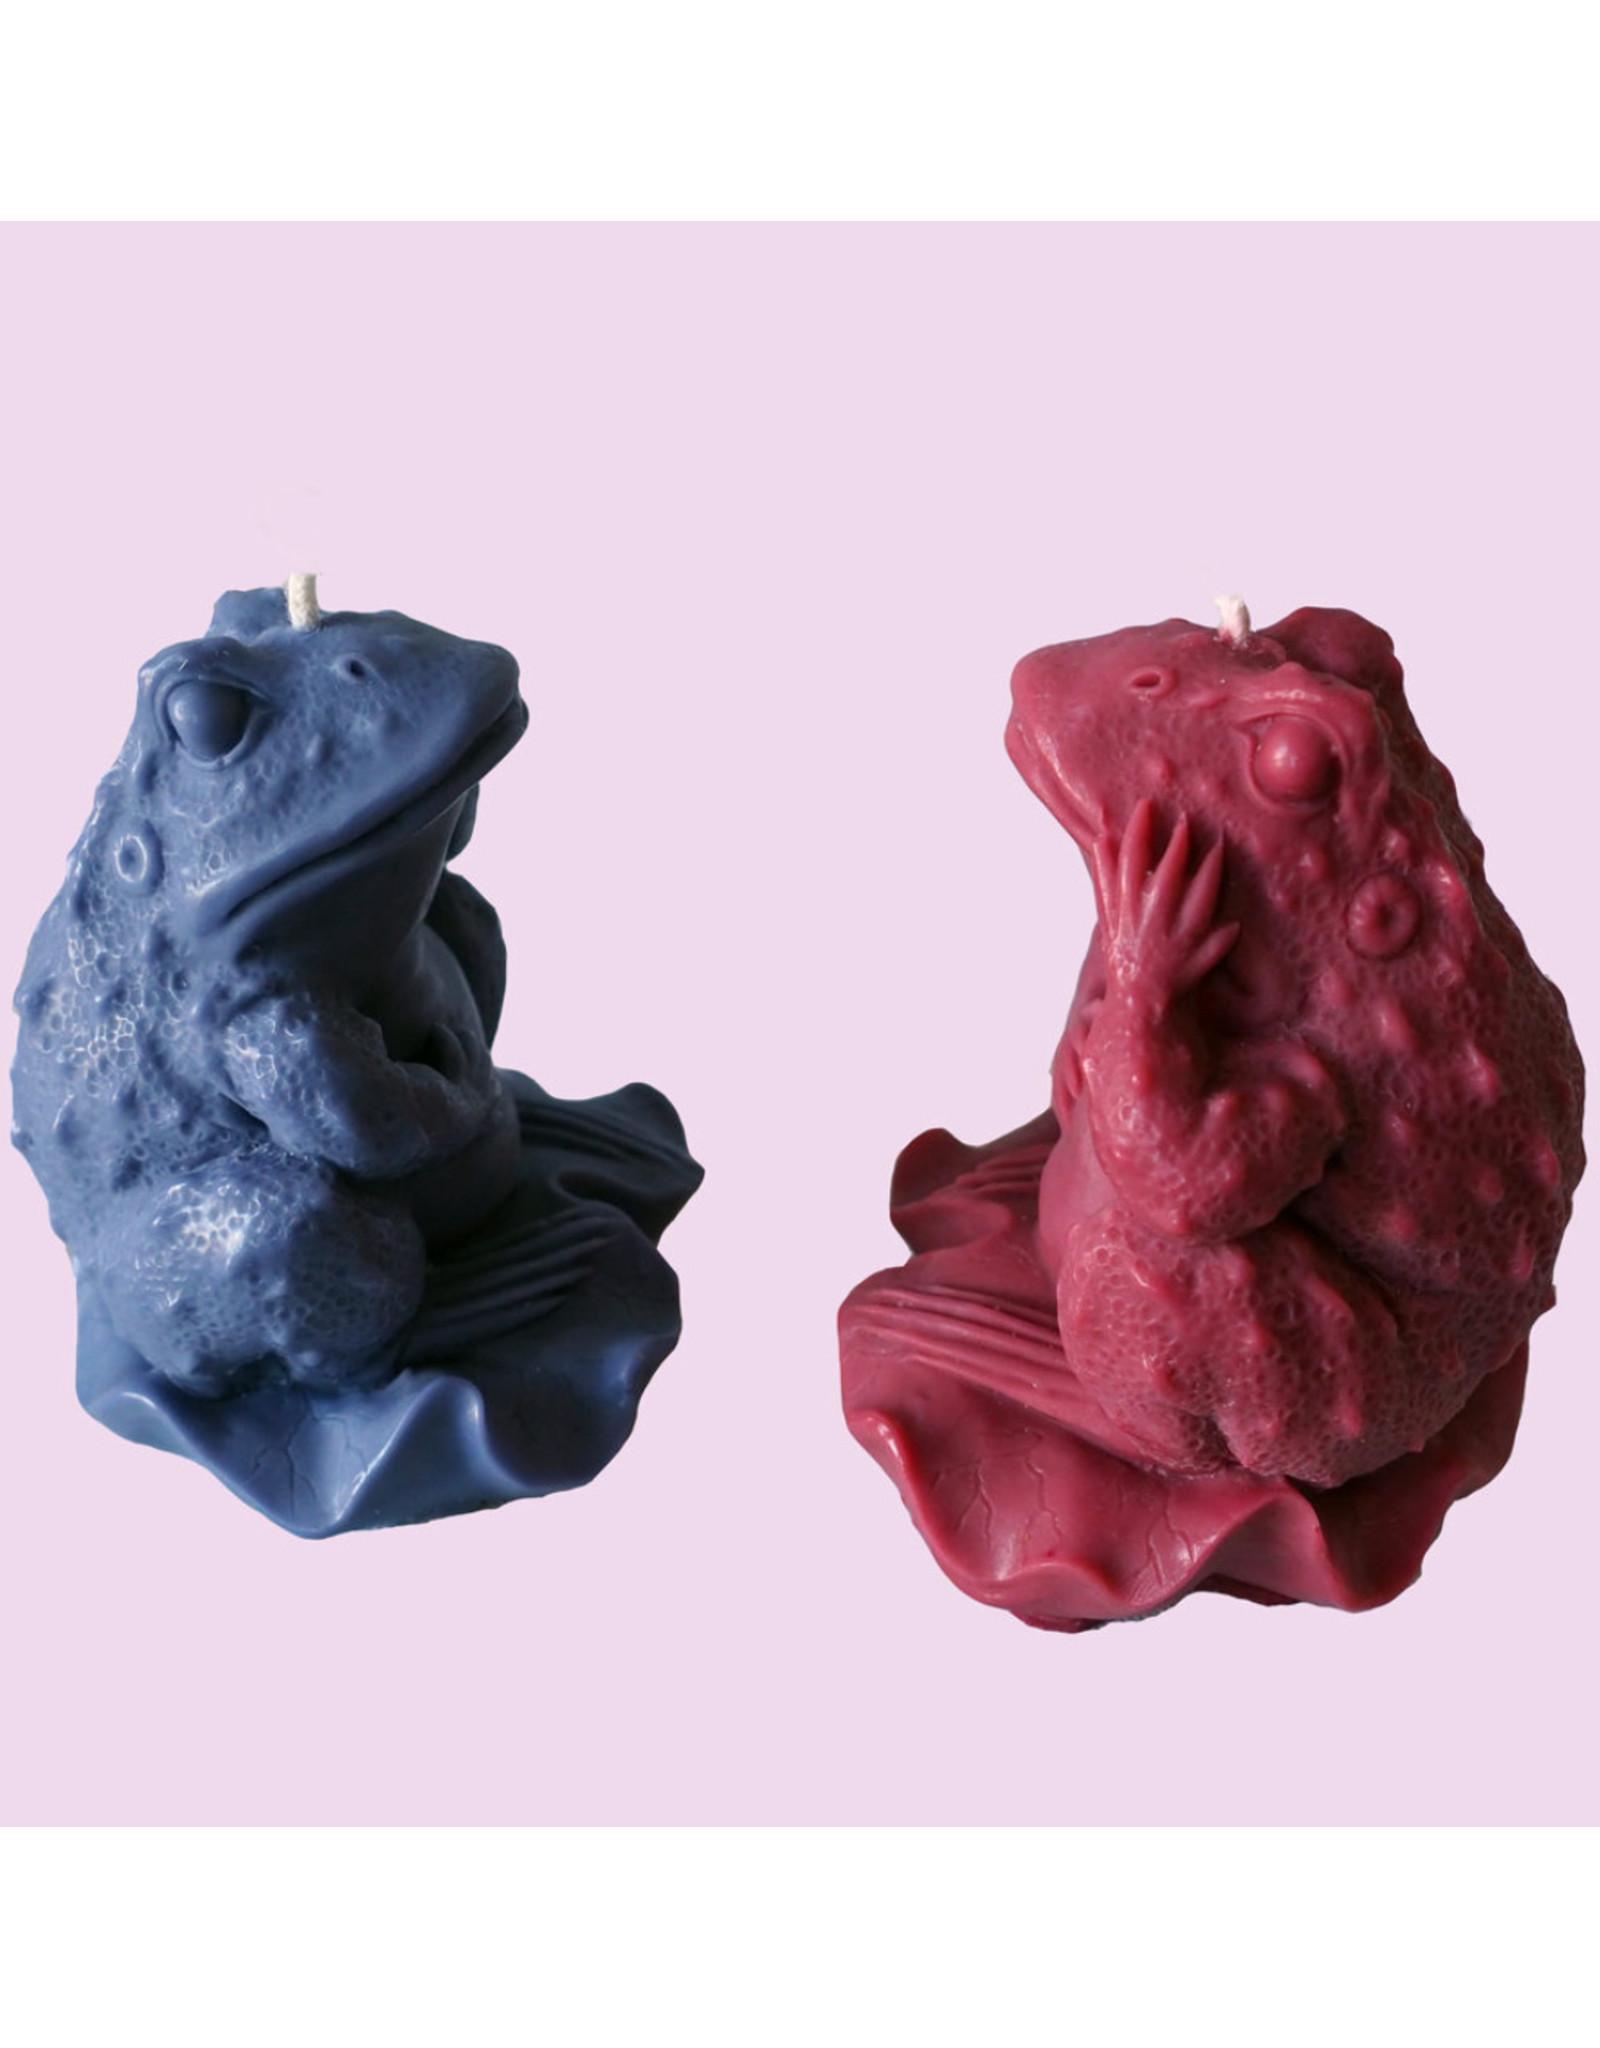 Babydoll Naturals Chandelle Crapaud Rouge/Clou de girofle